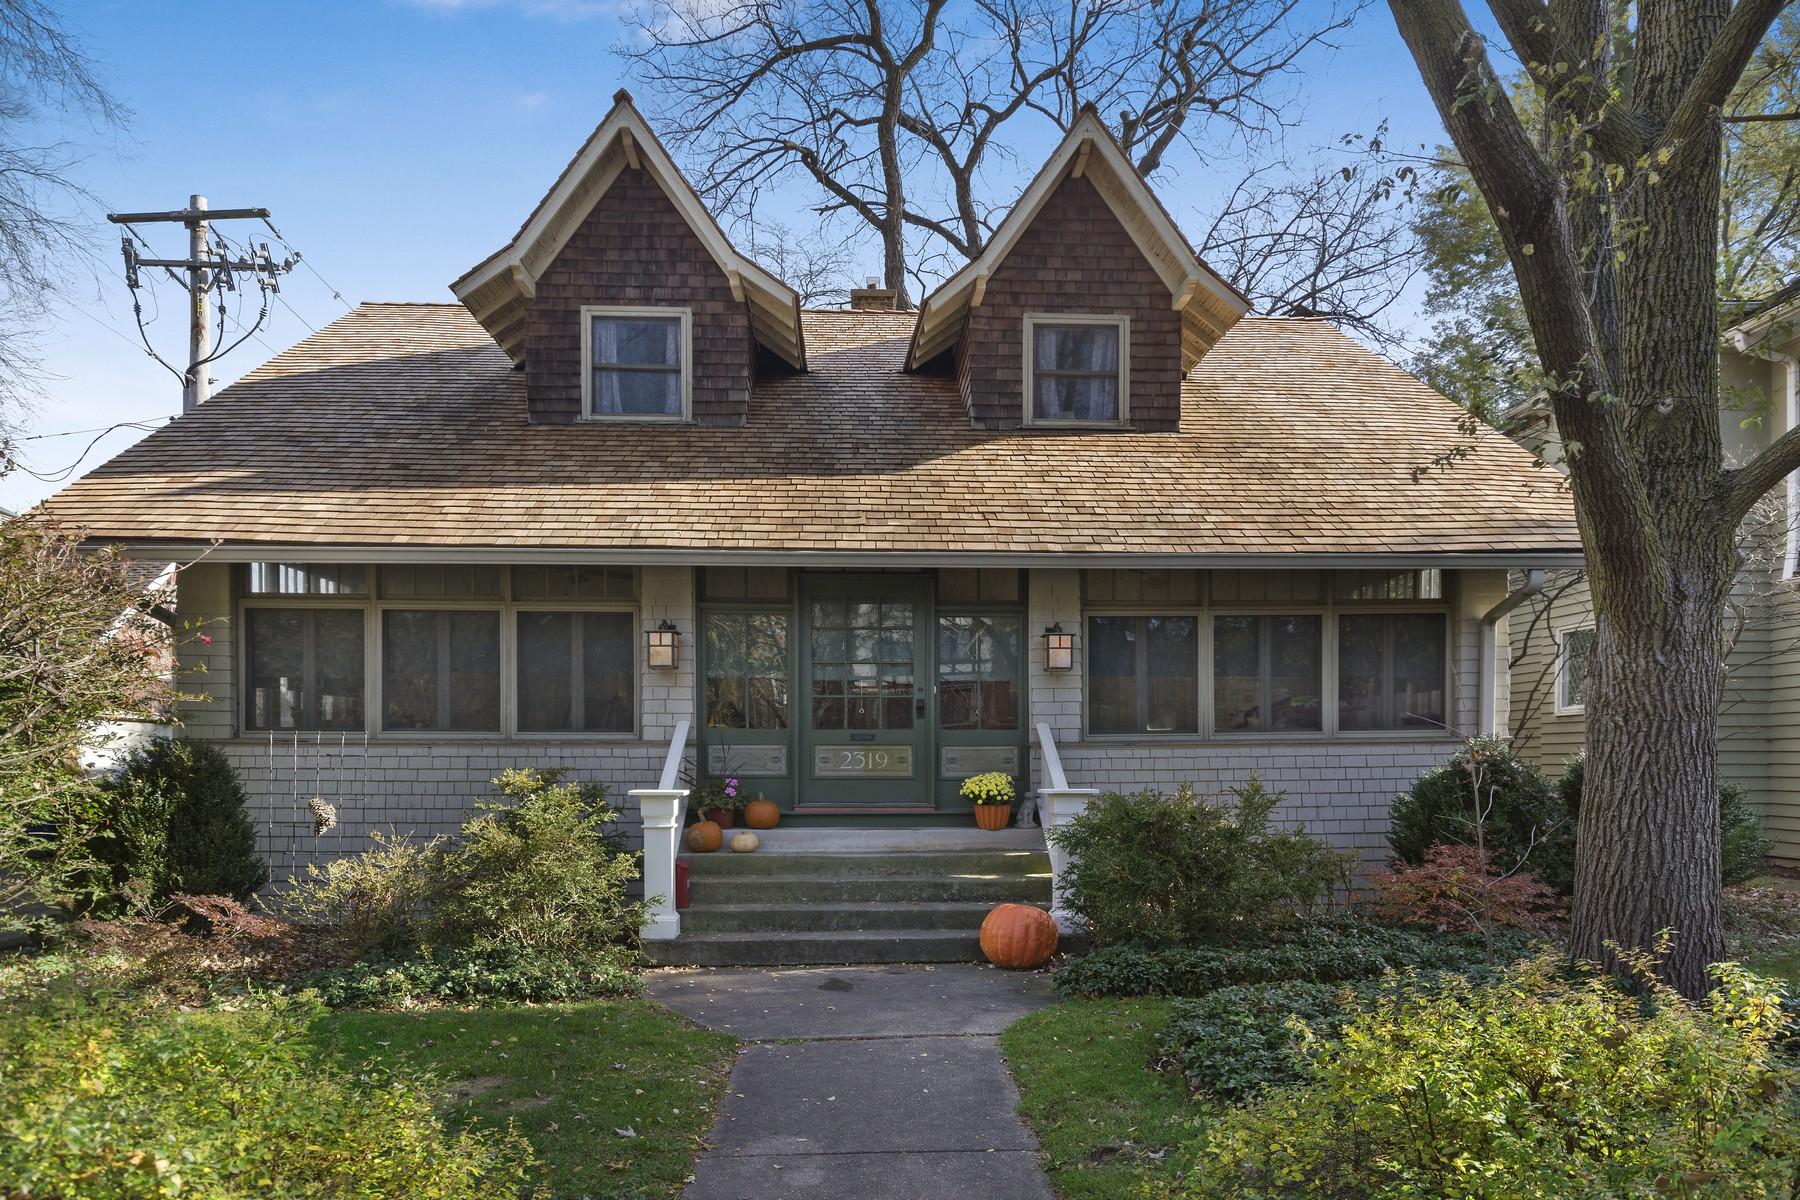 獨棟家庭住宅 為 出售 在 Charming Arts And Crafts Landmark Home 2319 Sherman Avenue Evanston, 伊利諾斯州, 60201 美國